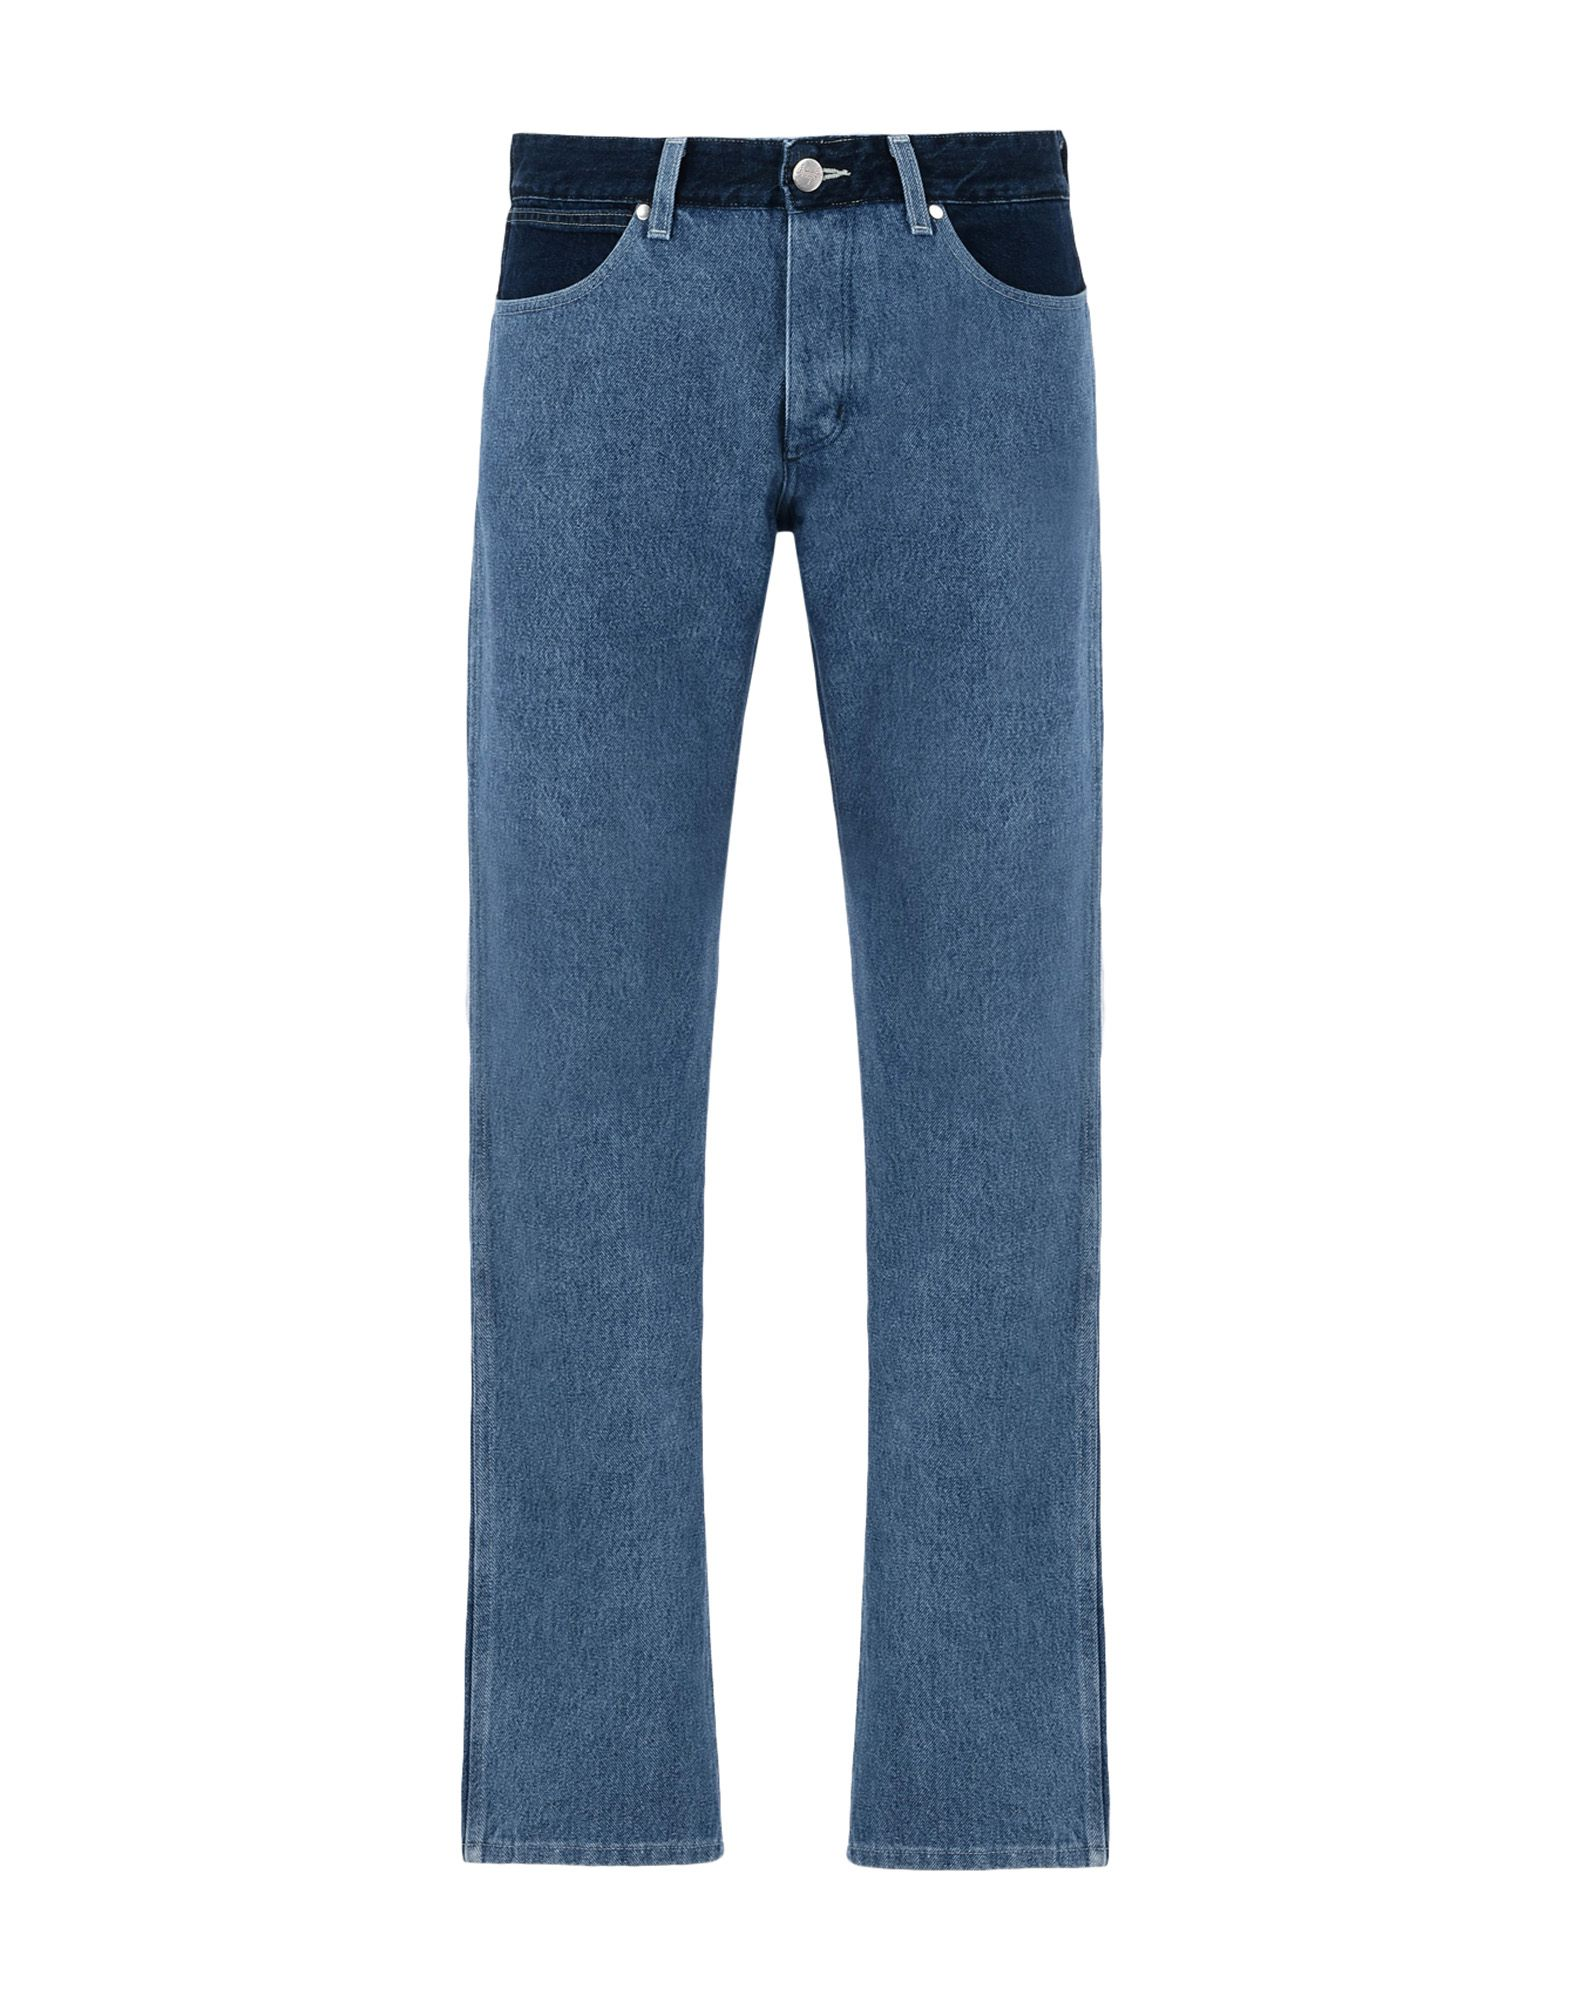 WRANGLER by PETER MAX Джинсовые брюки брюки wrangler w1216080k